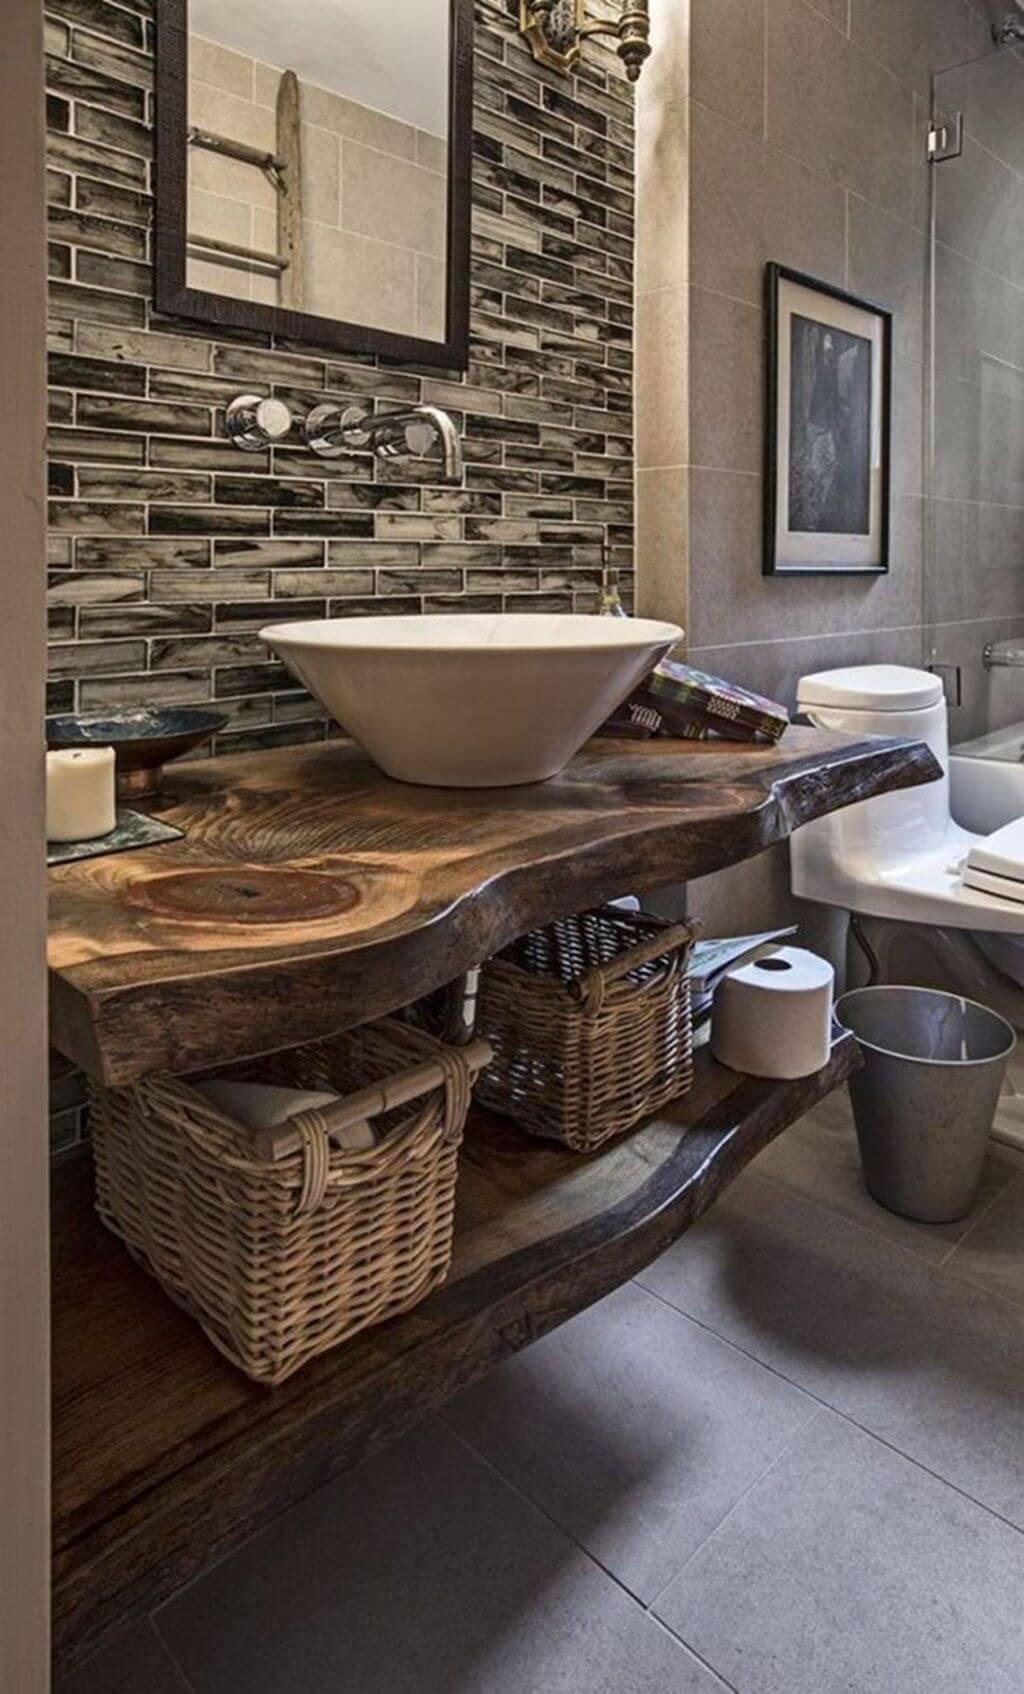 25 Cozy Rustic Bathroom Decor To Guide Your Renovation - W18